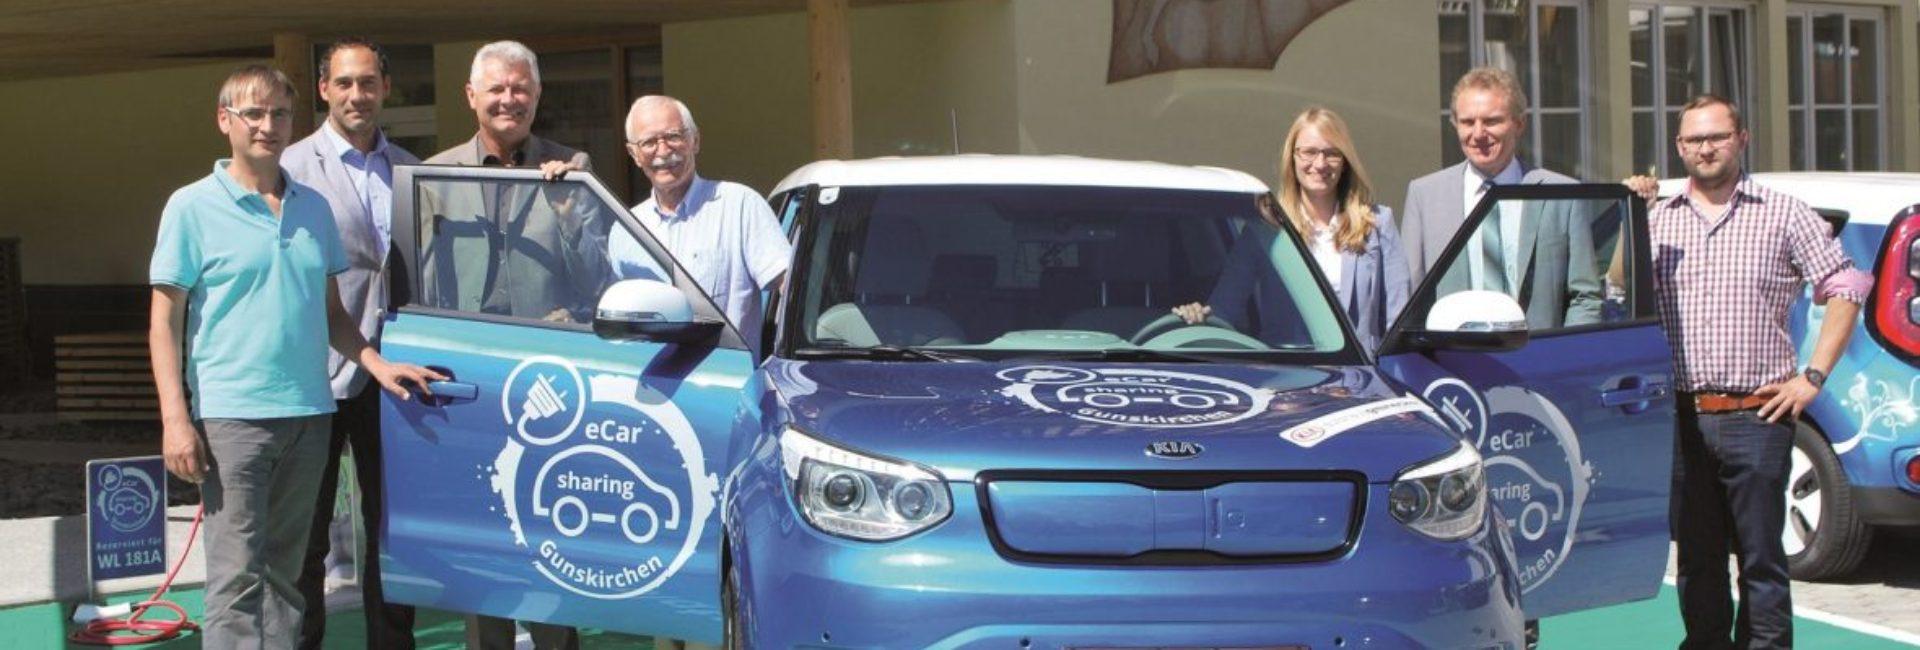 E-Carsharing Gunskirchen